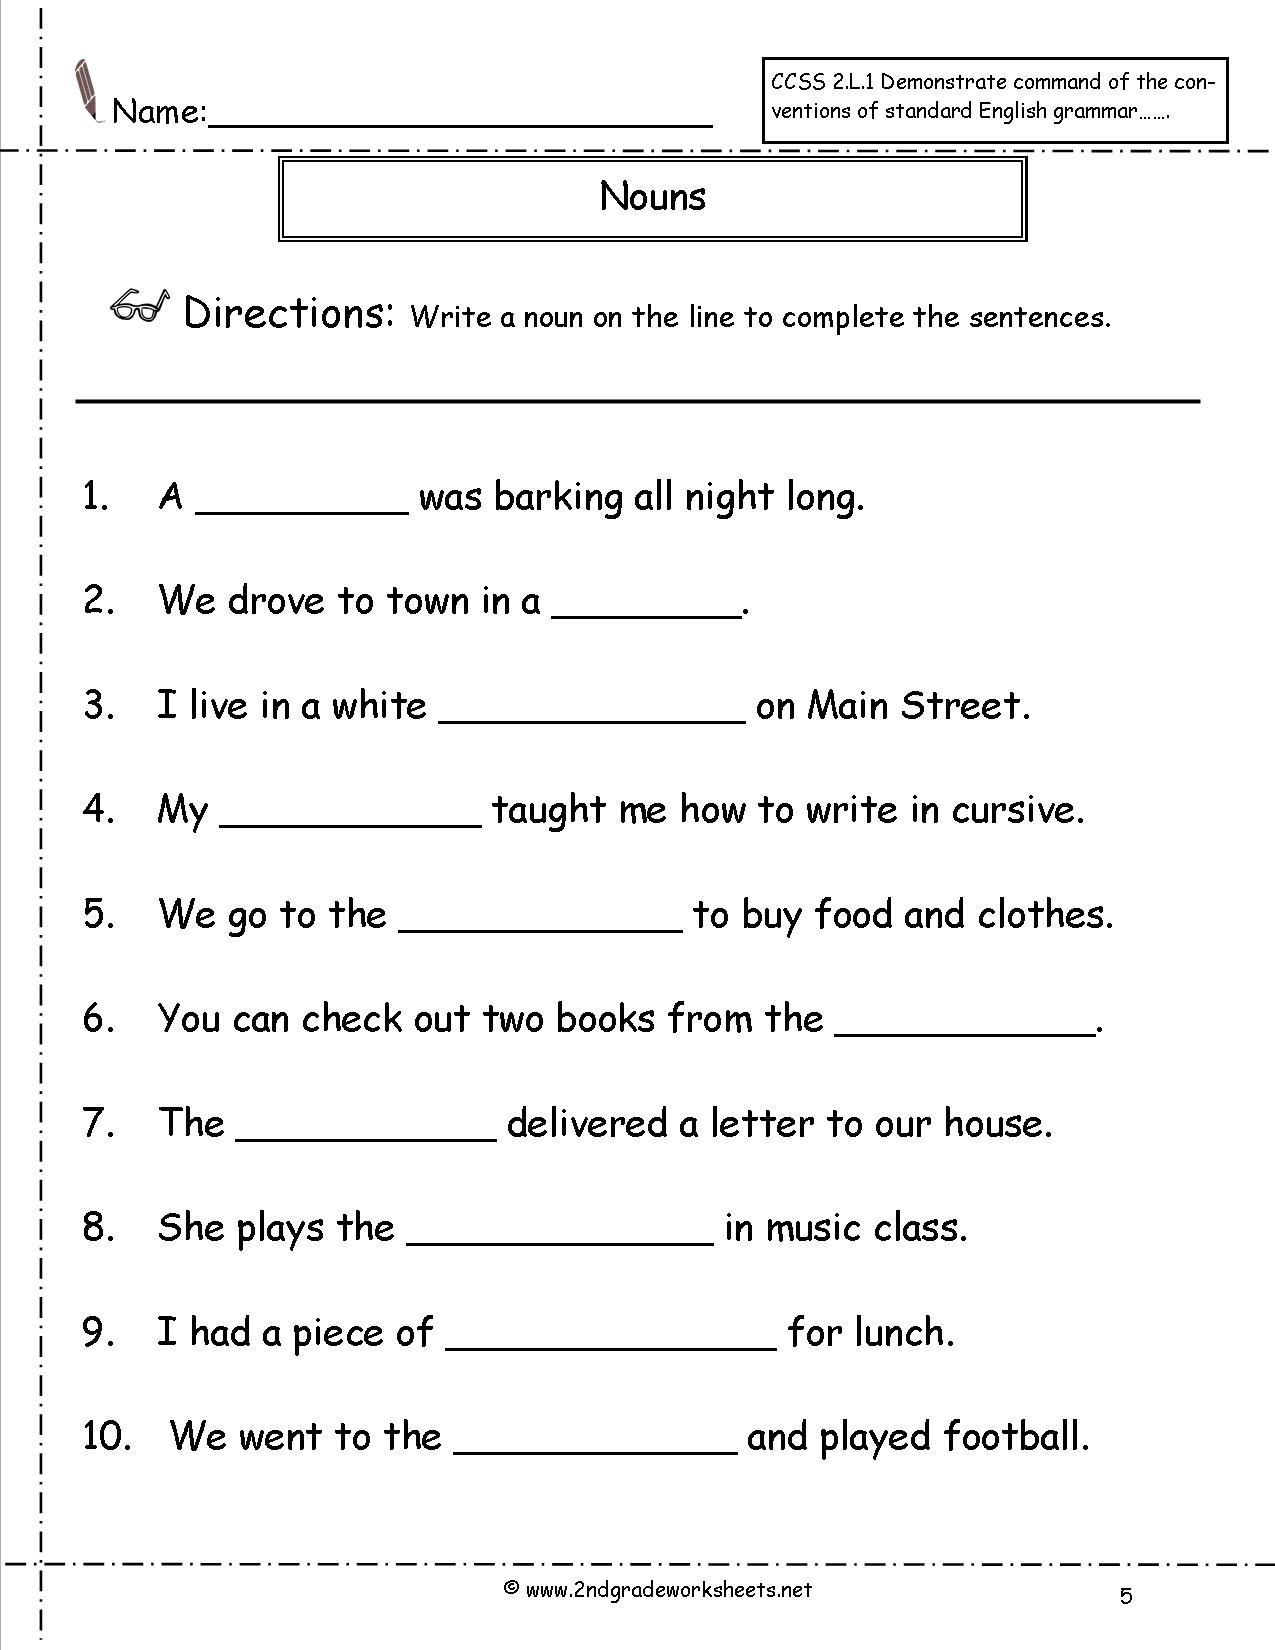 Nouns Worksheets 2nd Grade